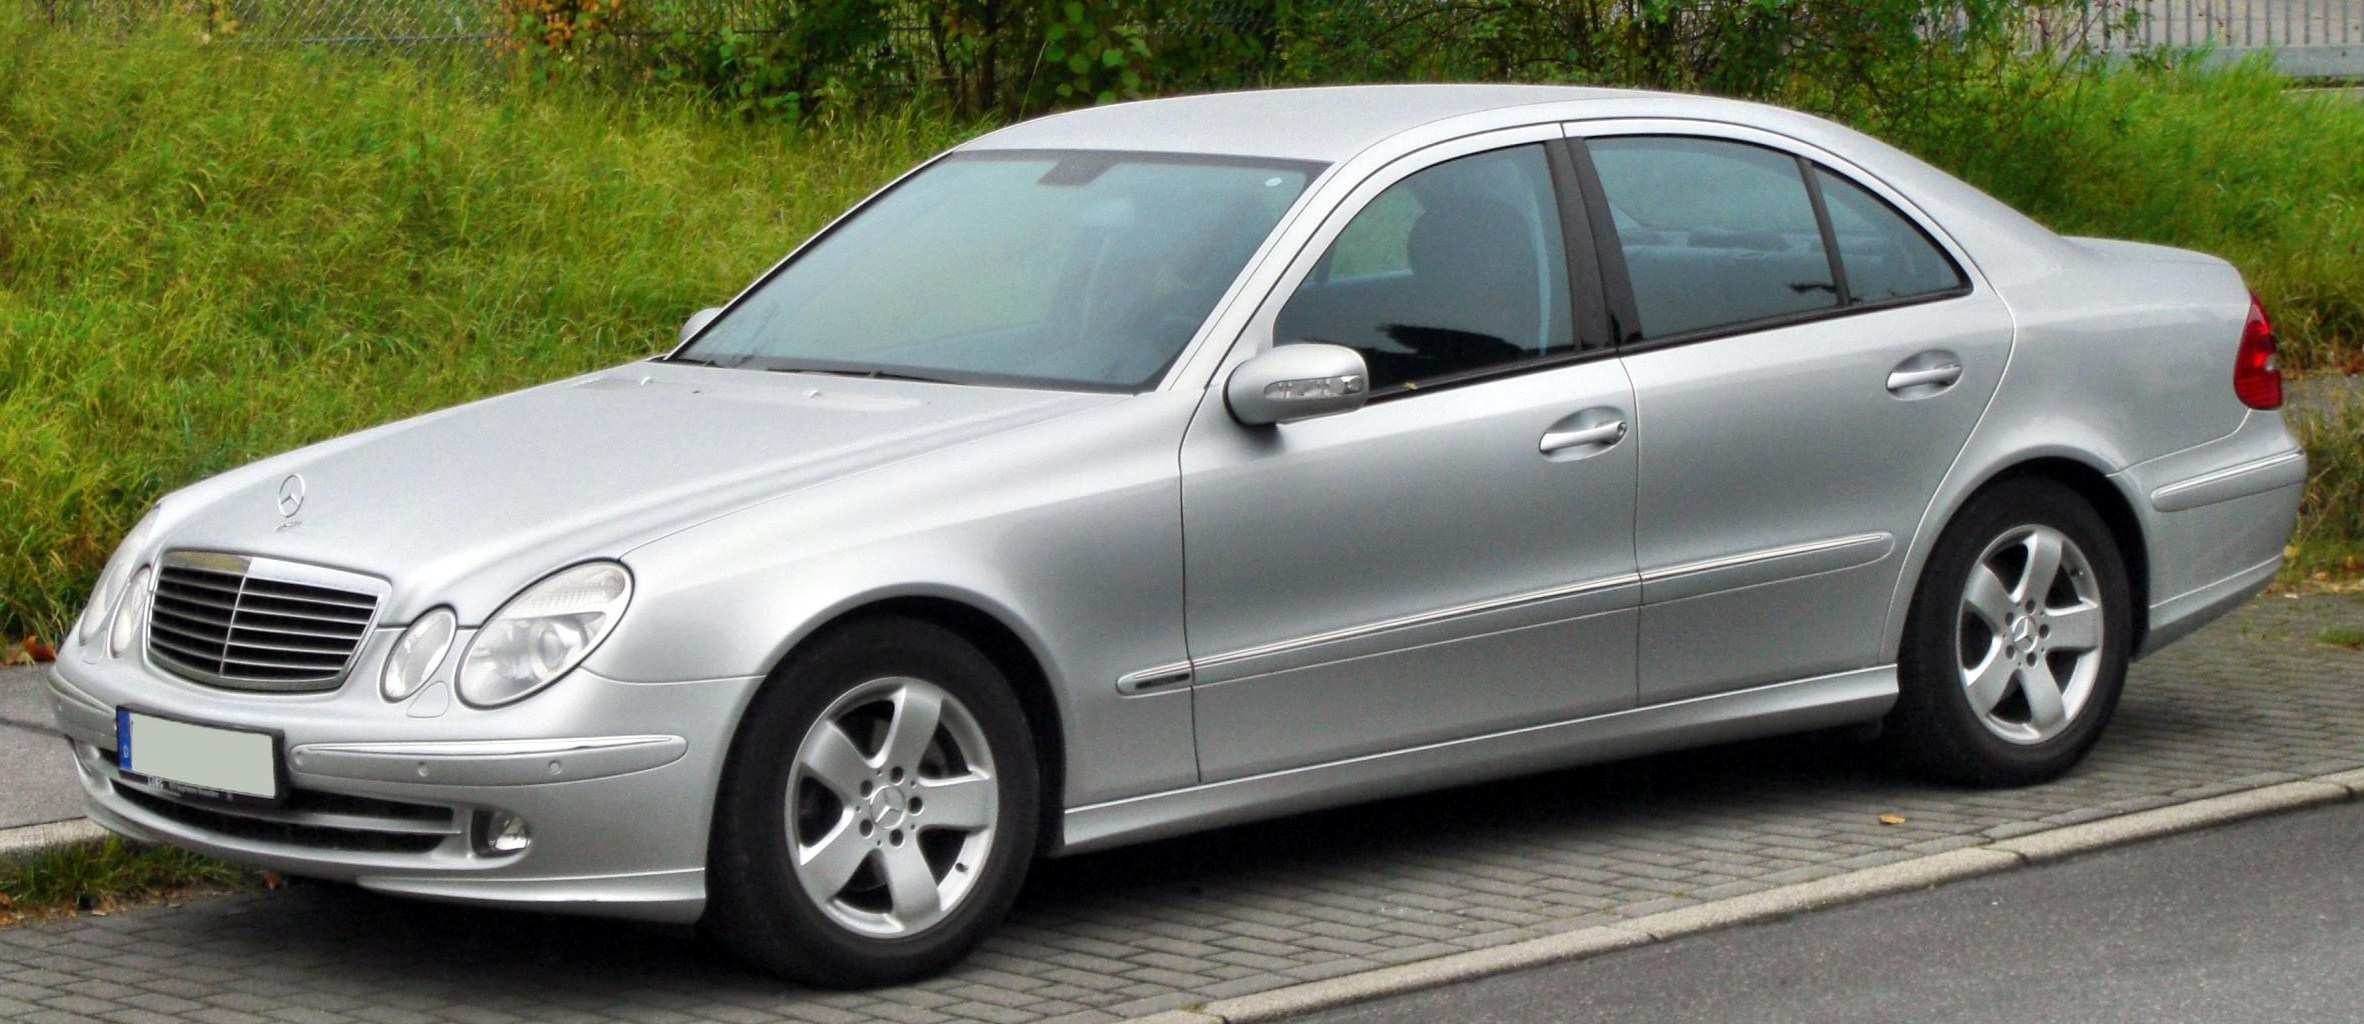 Mercedes benz e klasse amg partsopen for Mercedes benz e klasse